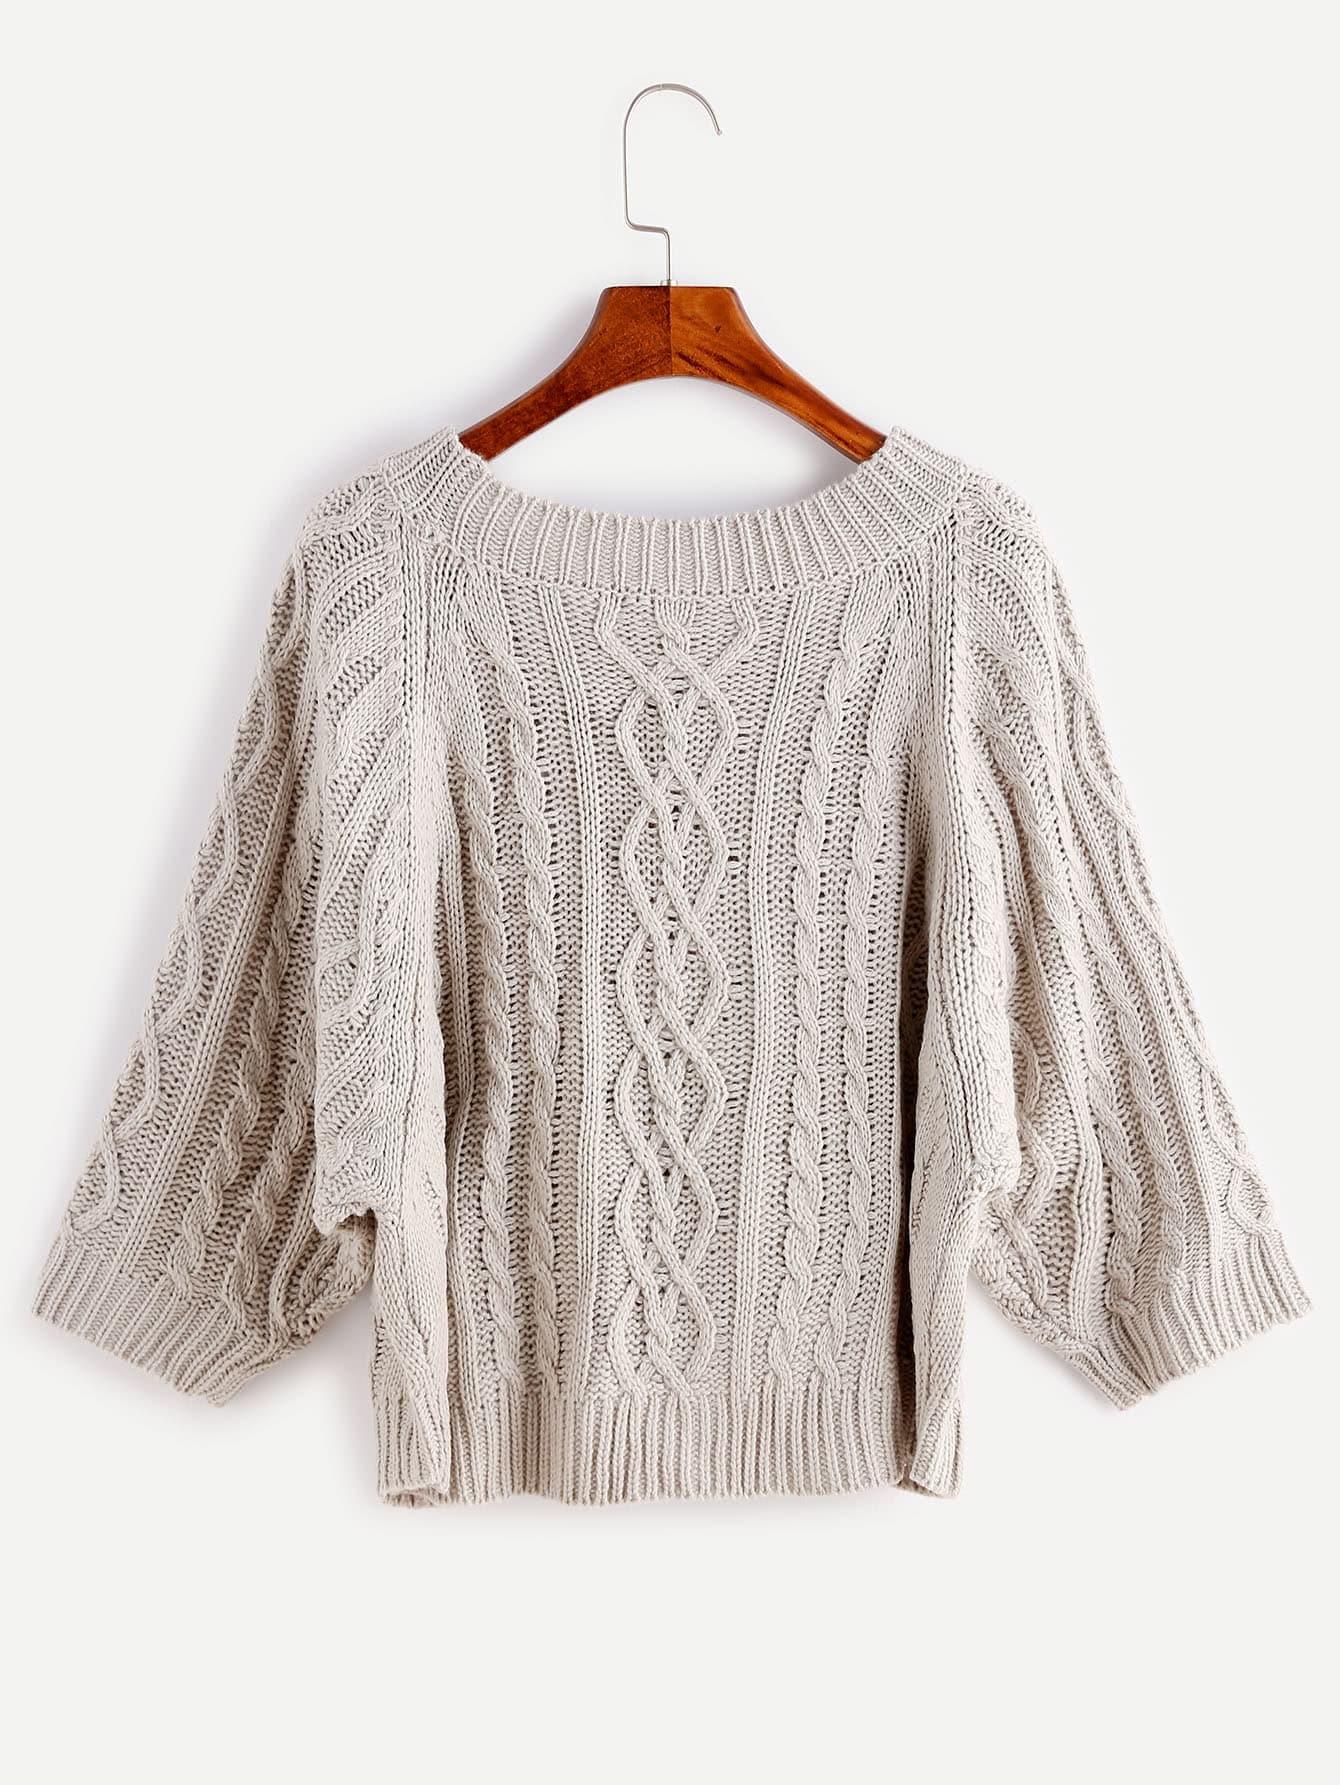 Knitting Pattern For Dolman Sleeve Sweater : Grey Cable Knit Dolman Sleeve Sweater -SheIn(Sheinside)